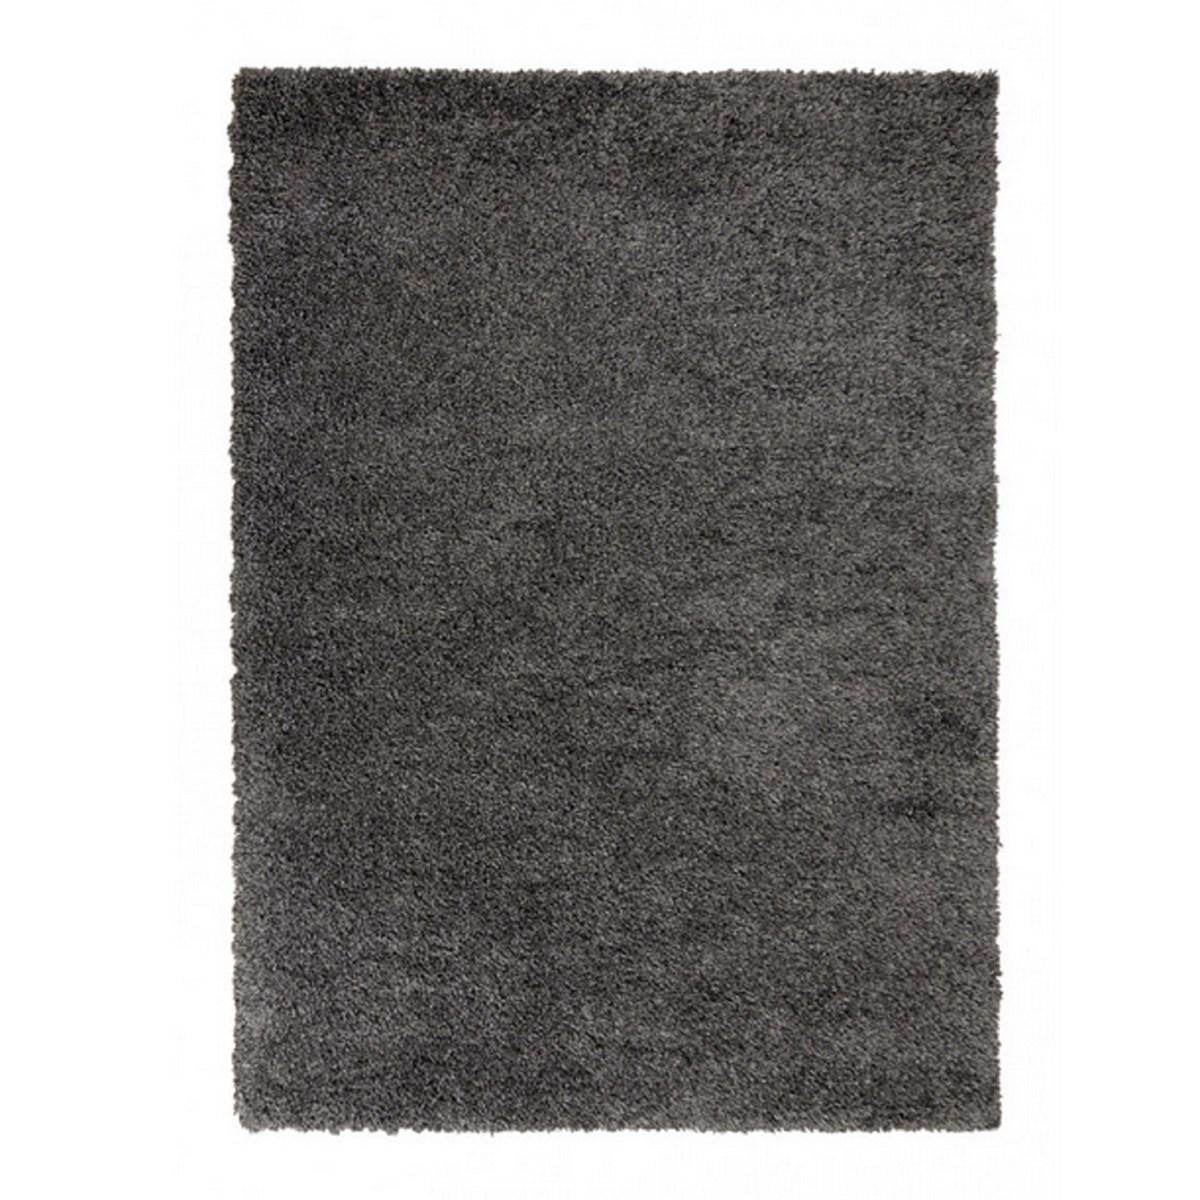 Tapis shaggy en Polypropylène Gris anthracite 80x160 cm